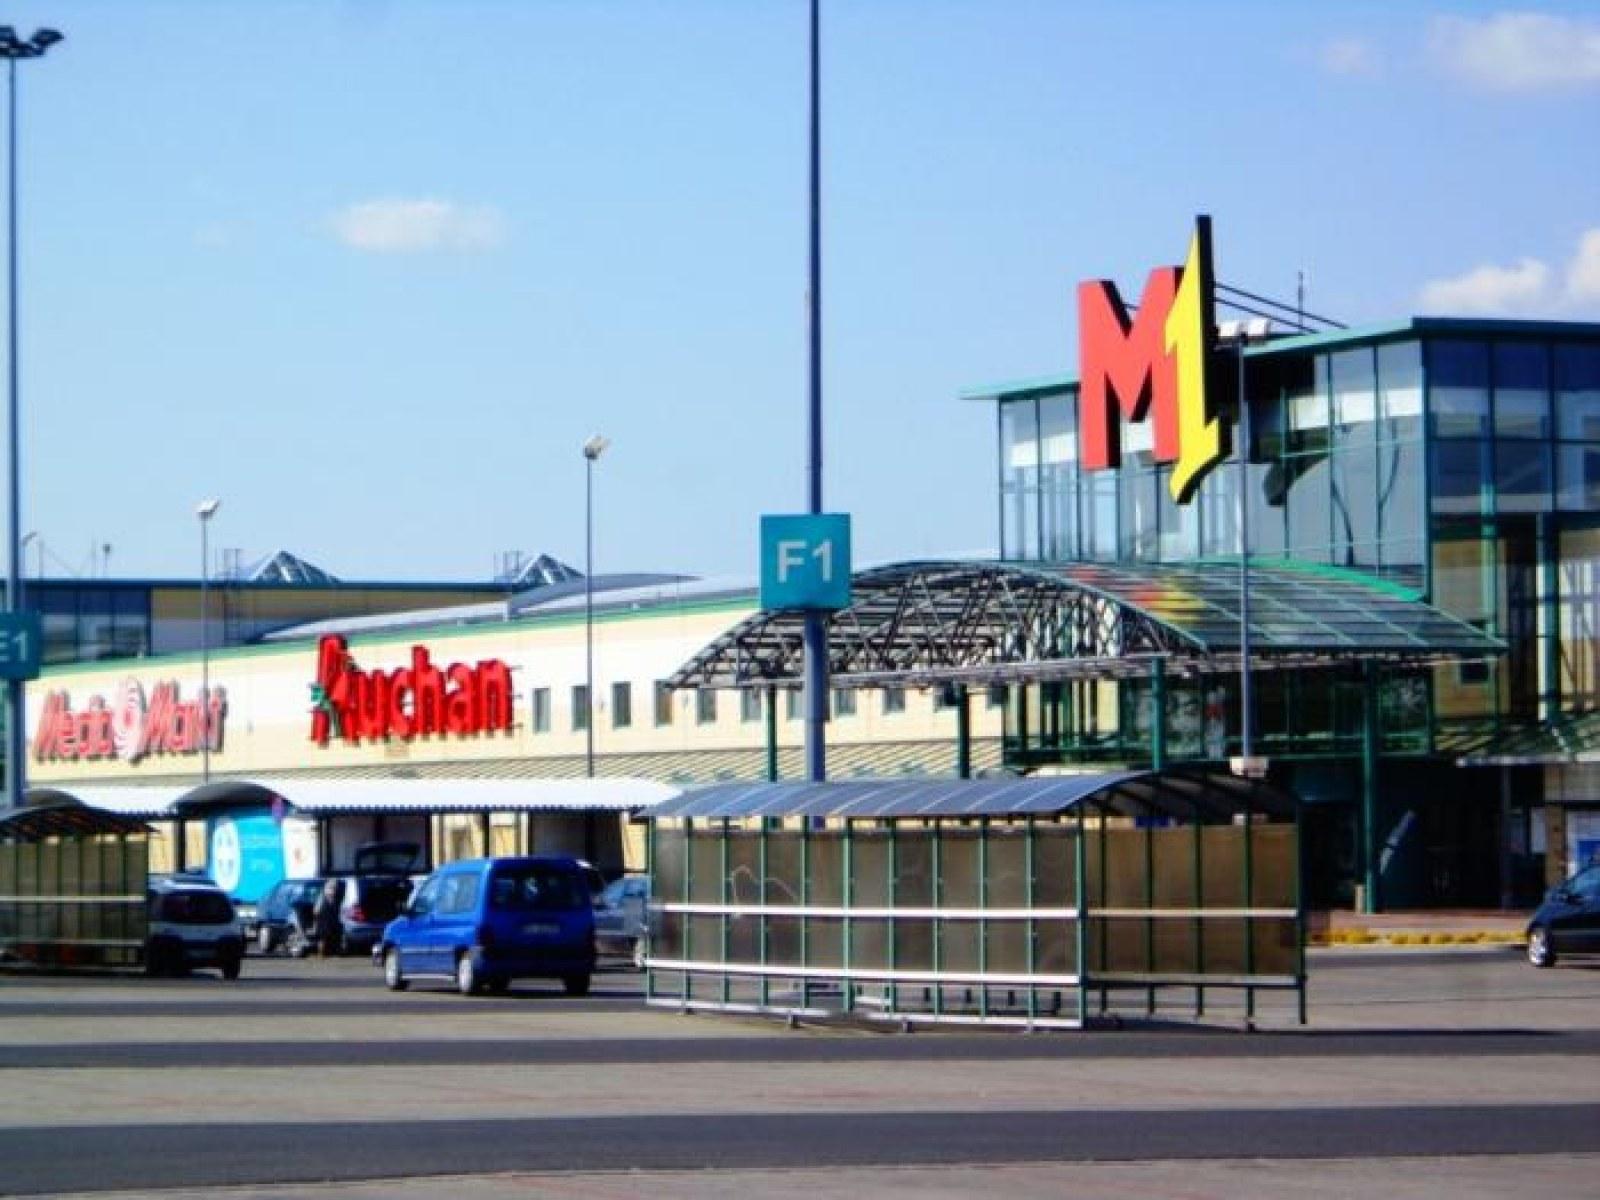 Centrum handlowe M1 Łódź, Łódź